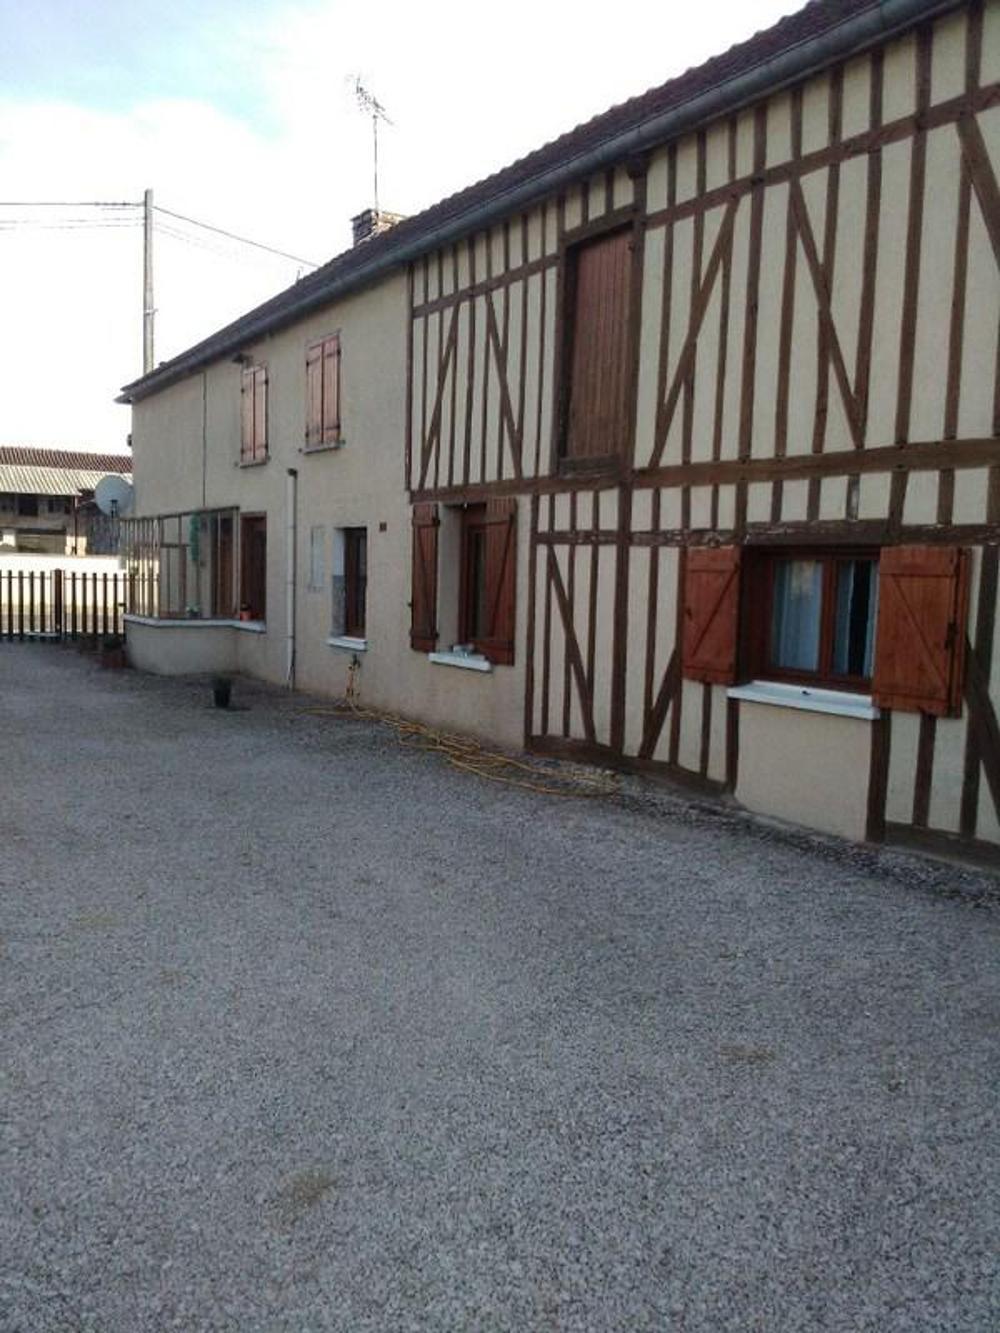 Brienne-le-Château Aube Haus Bild 3553827